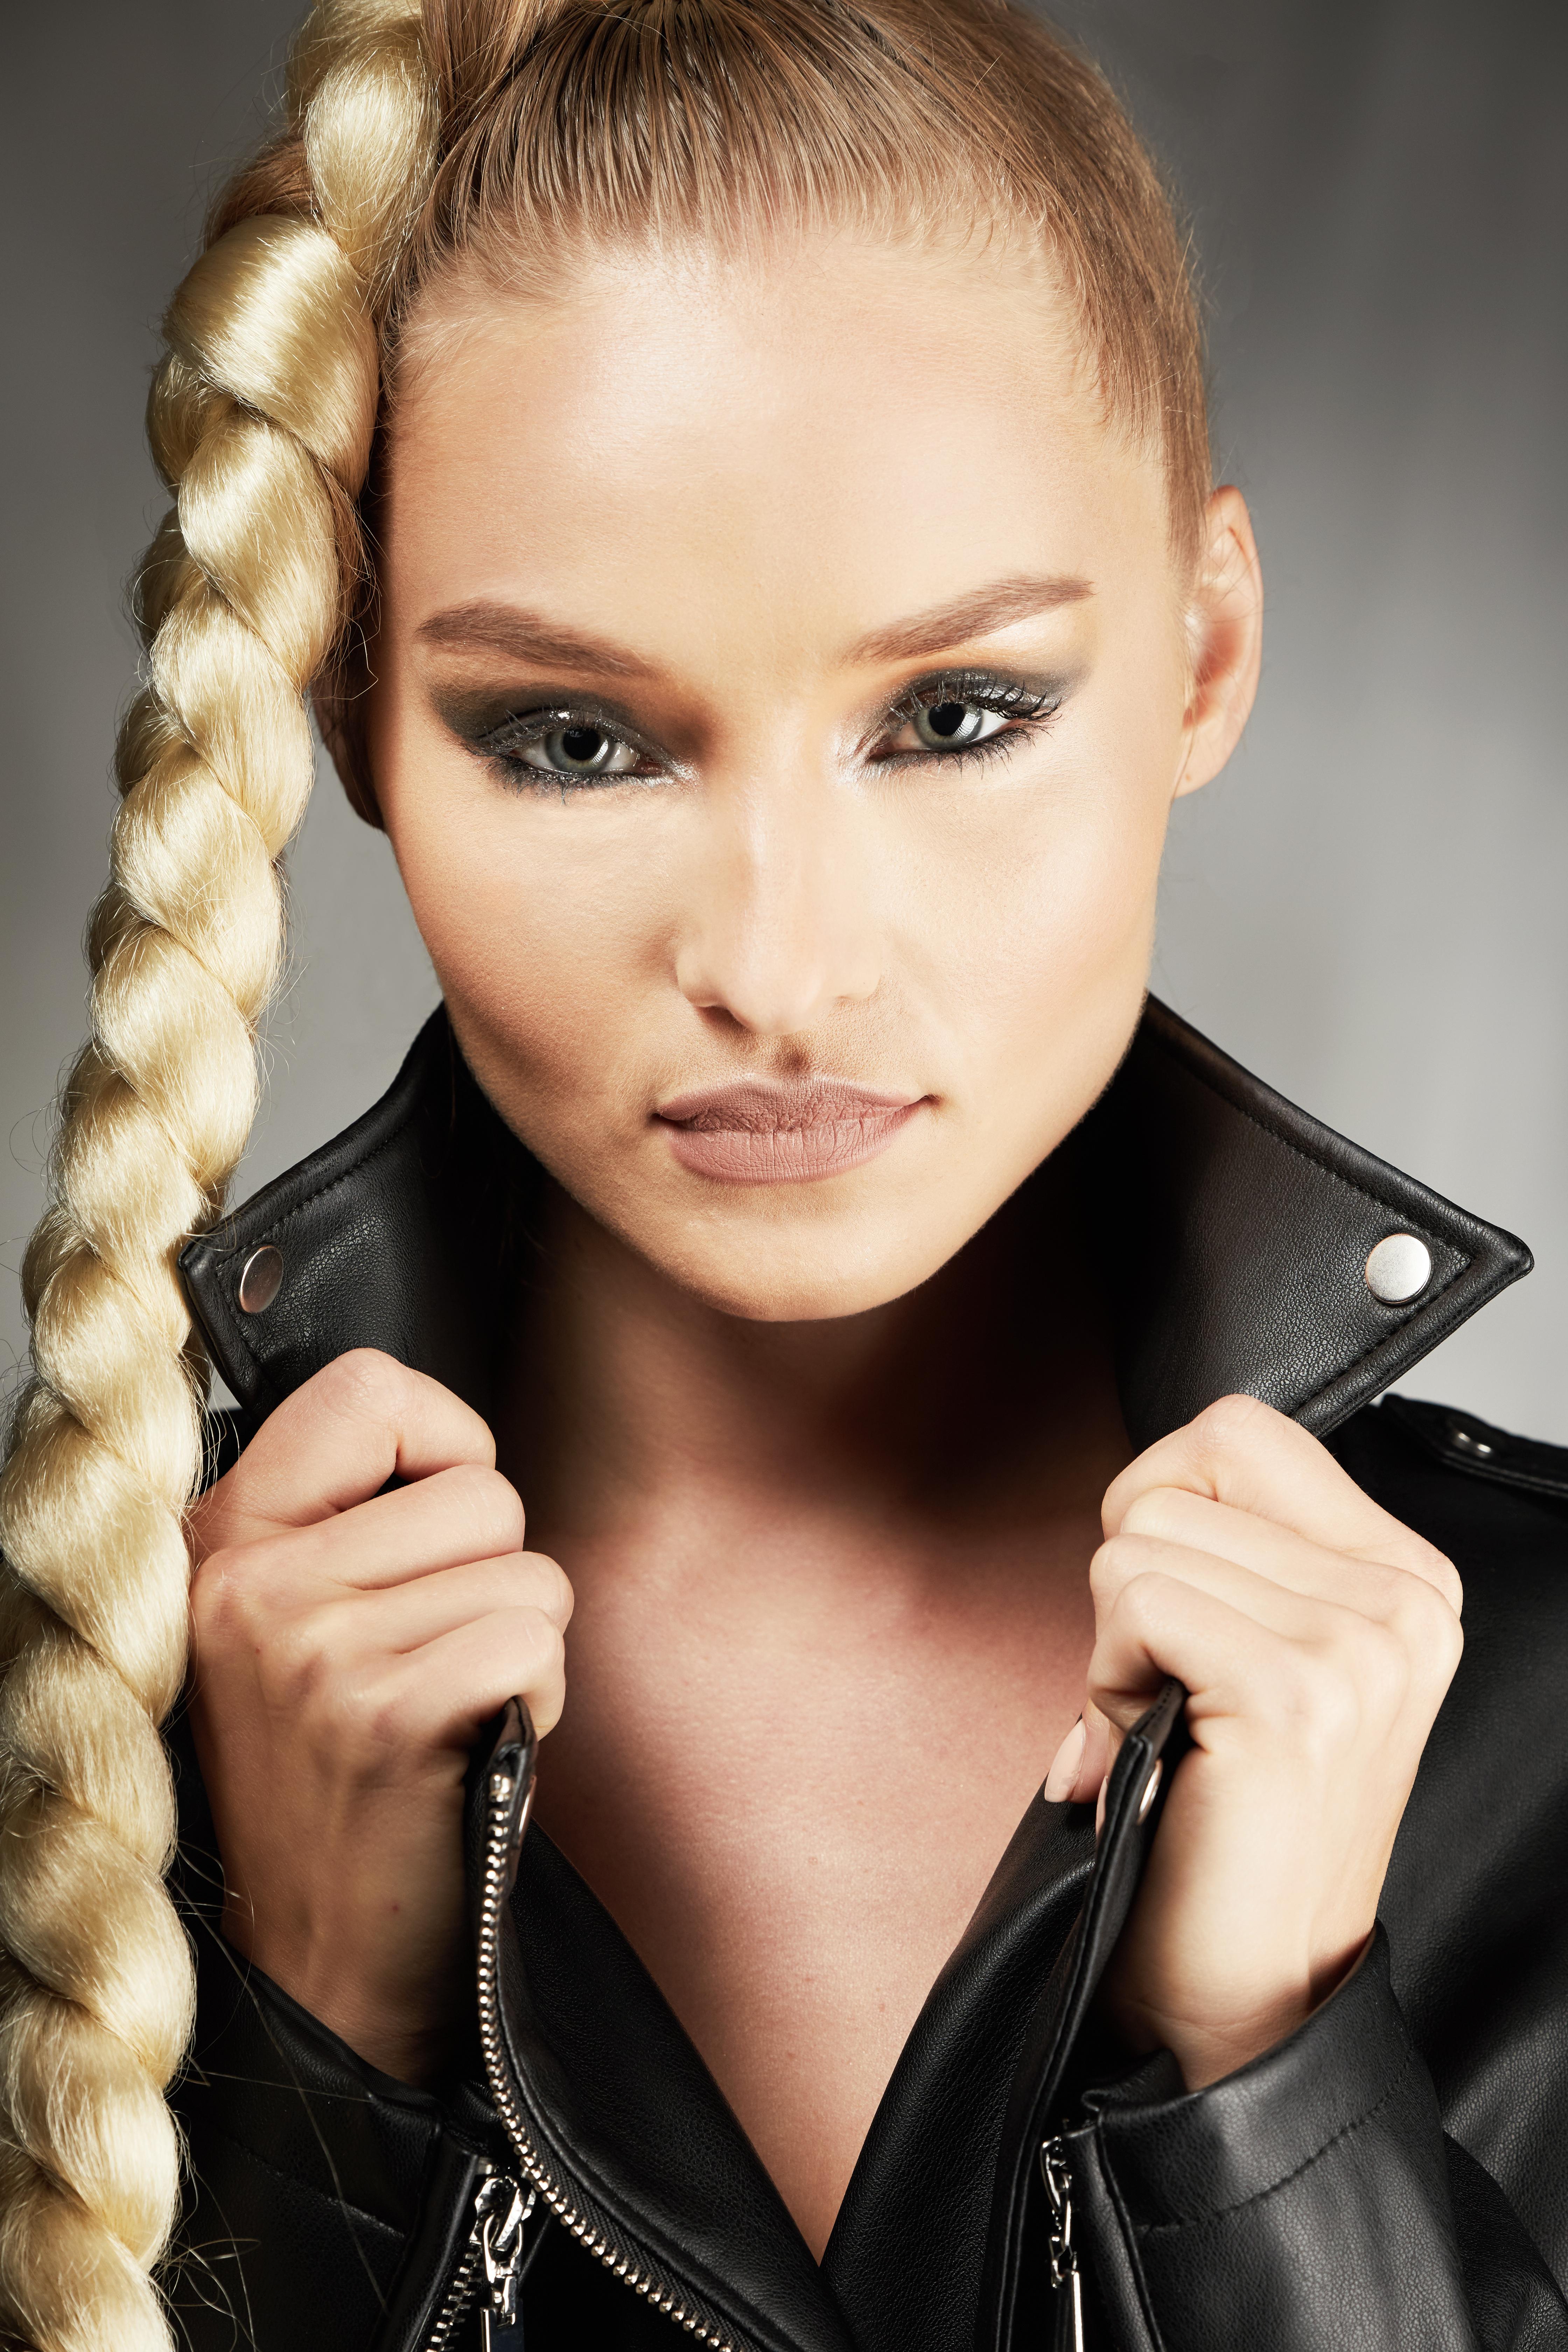 Christina rock 1